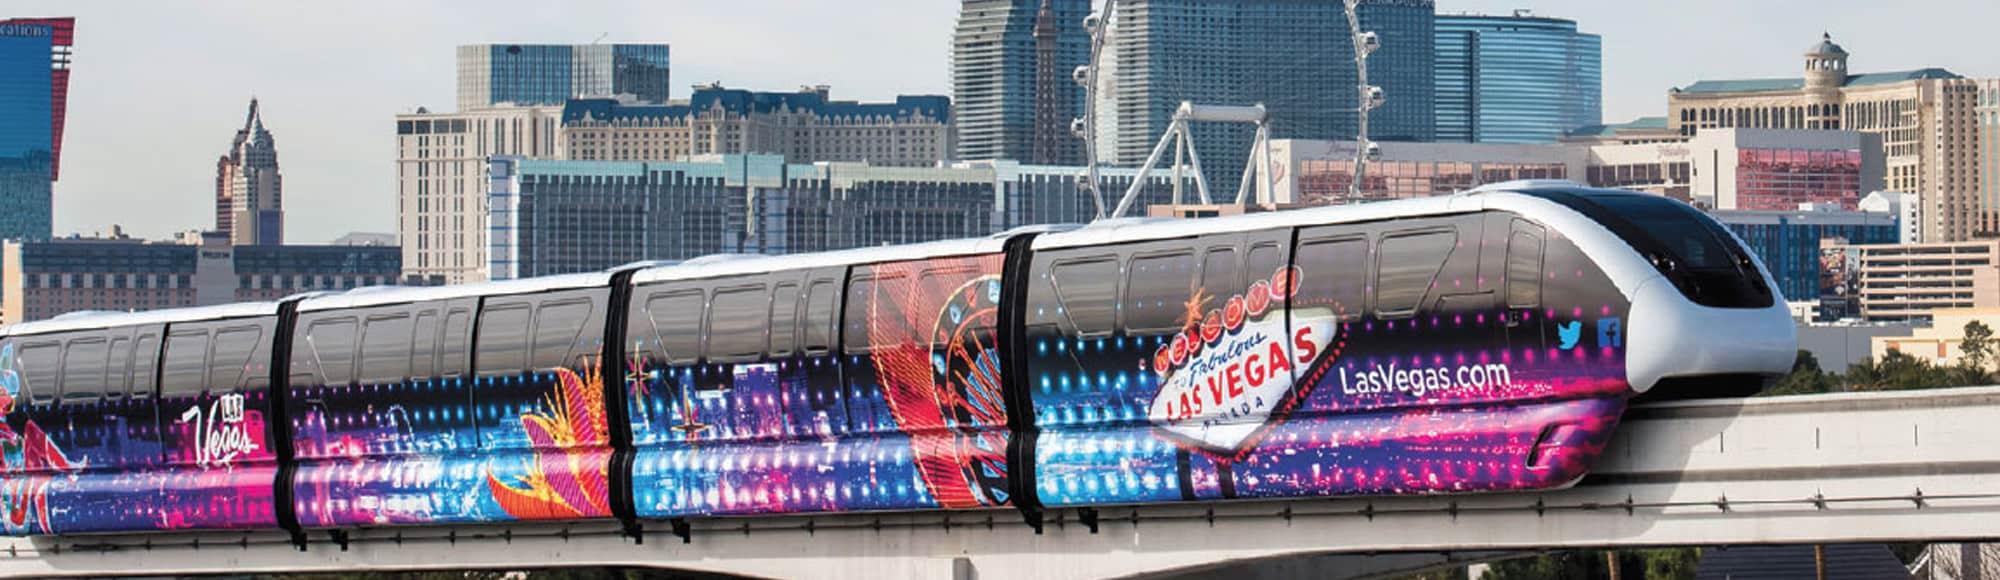 Las Vegas Monorail Featured Deal